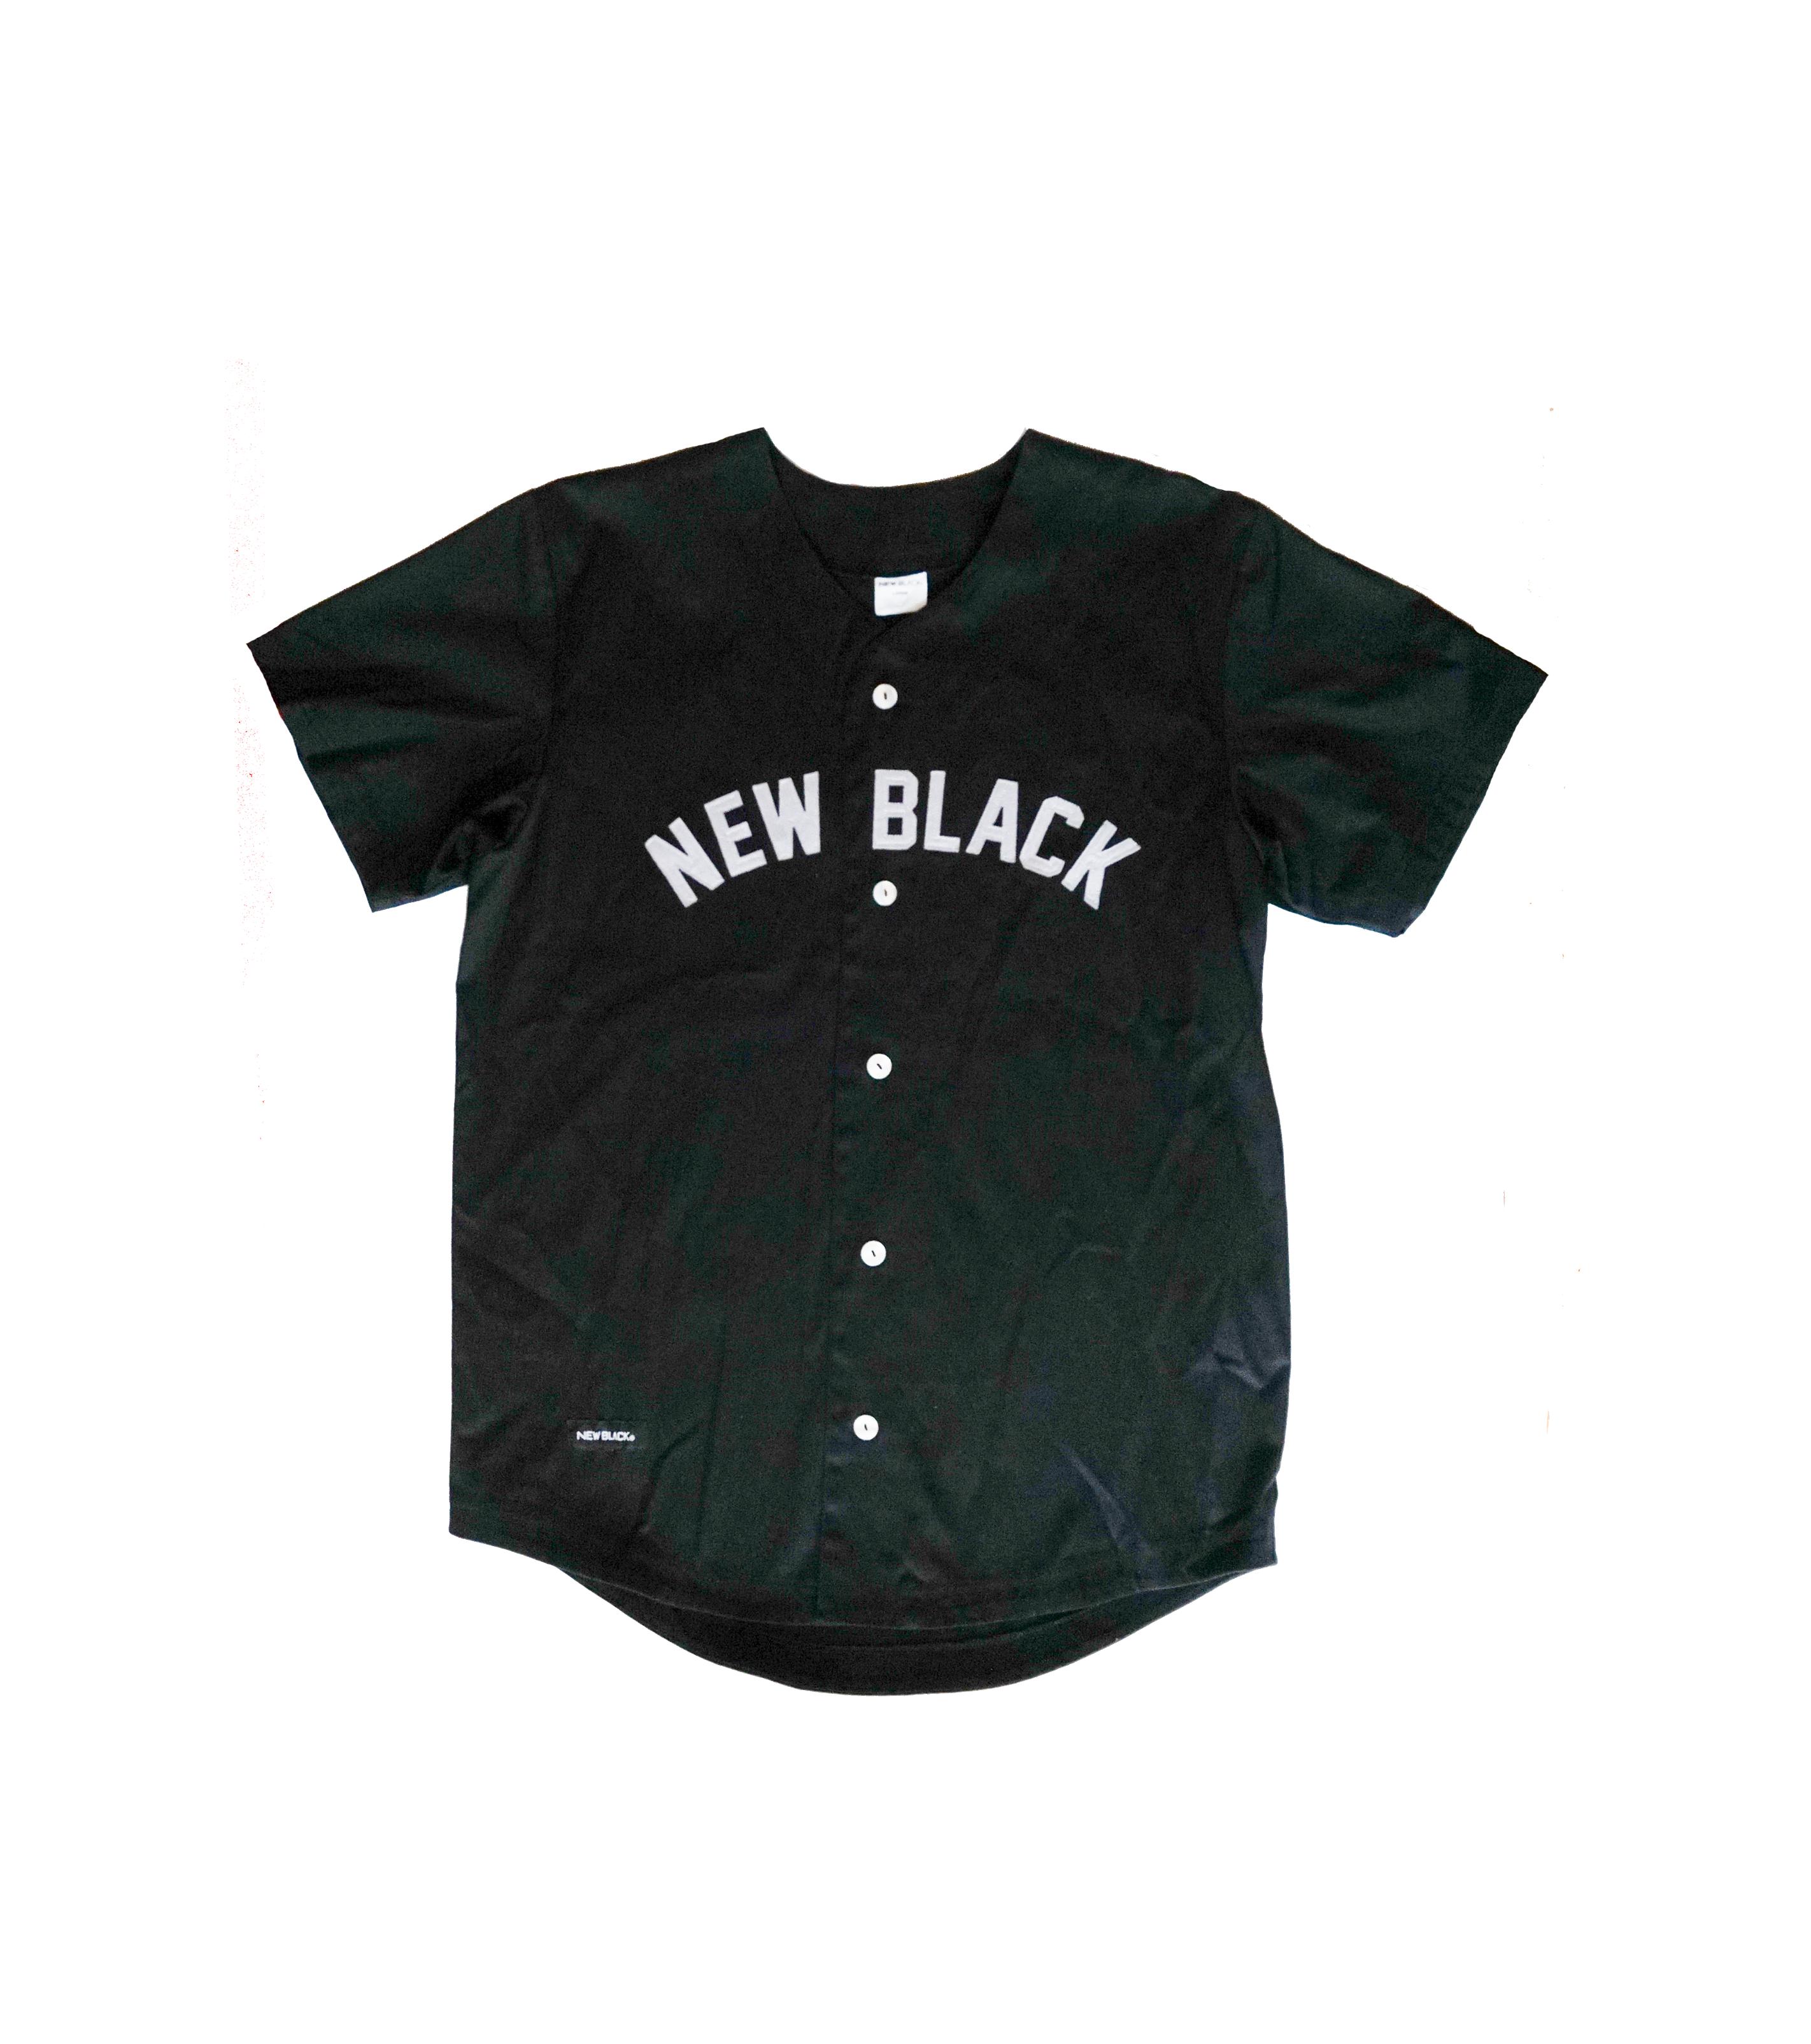 New Black Jersey